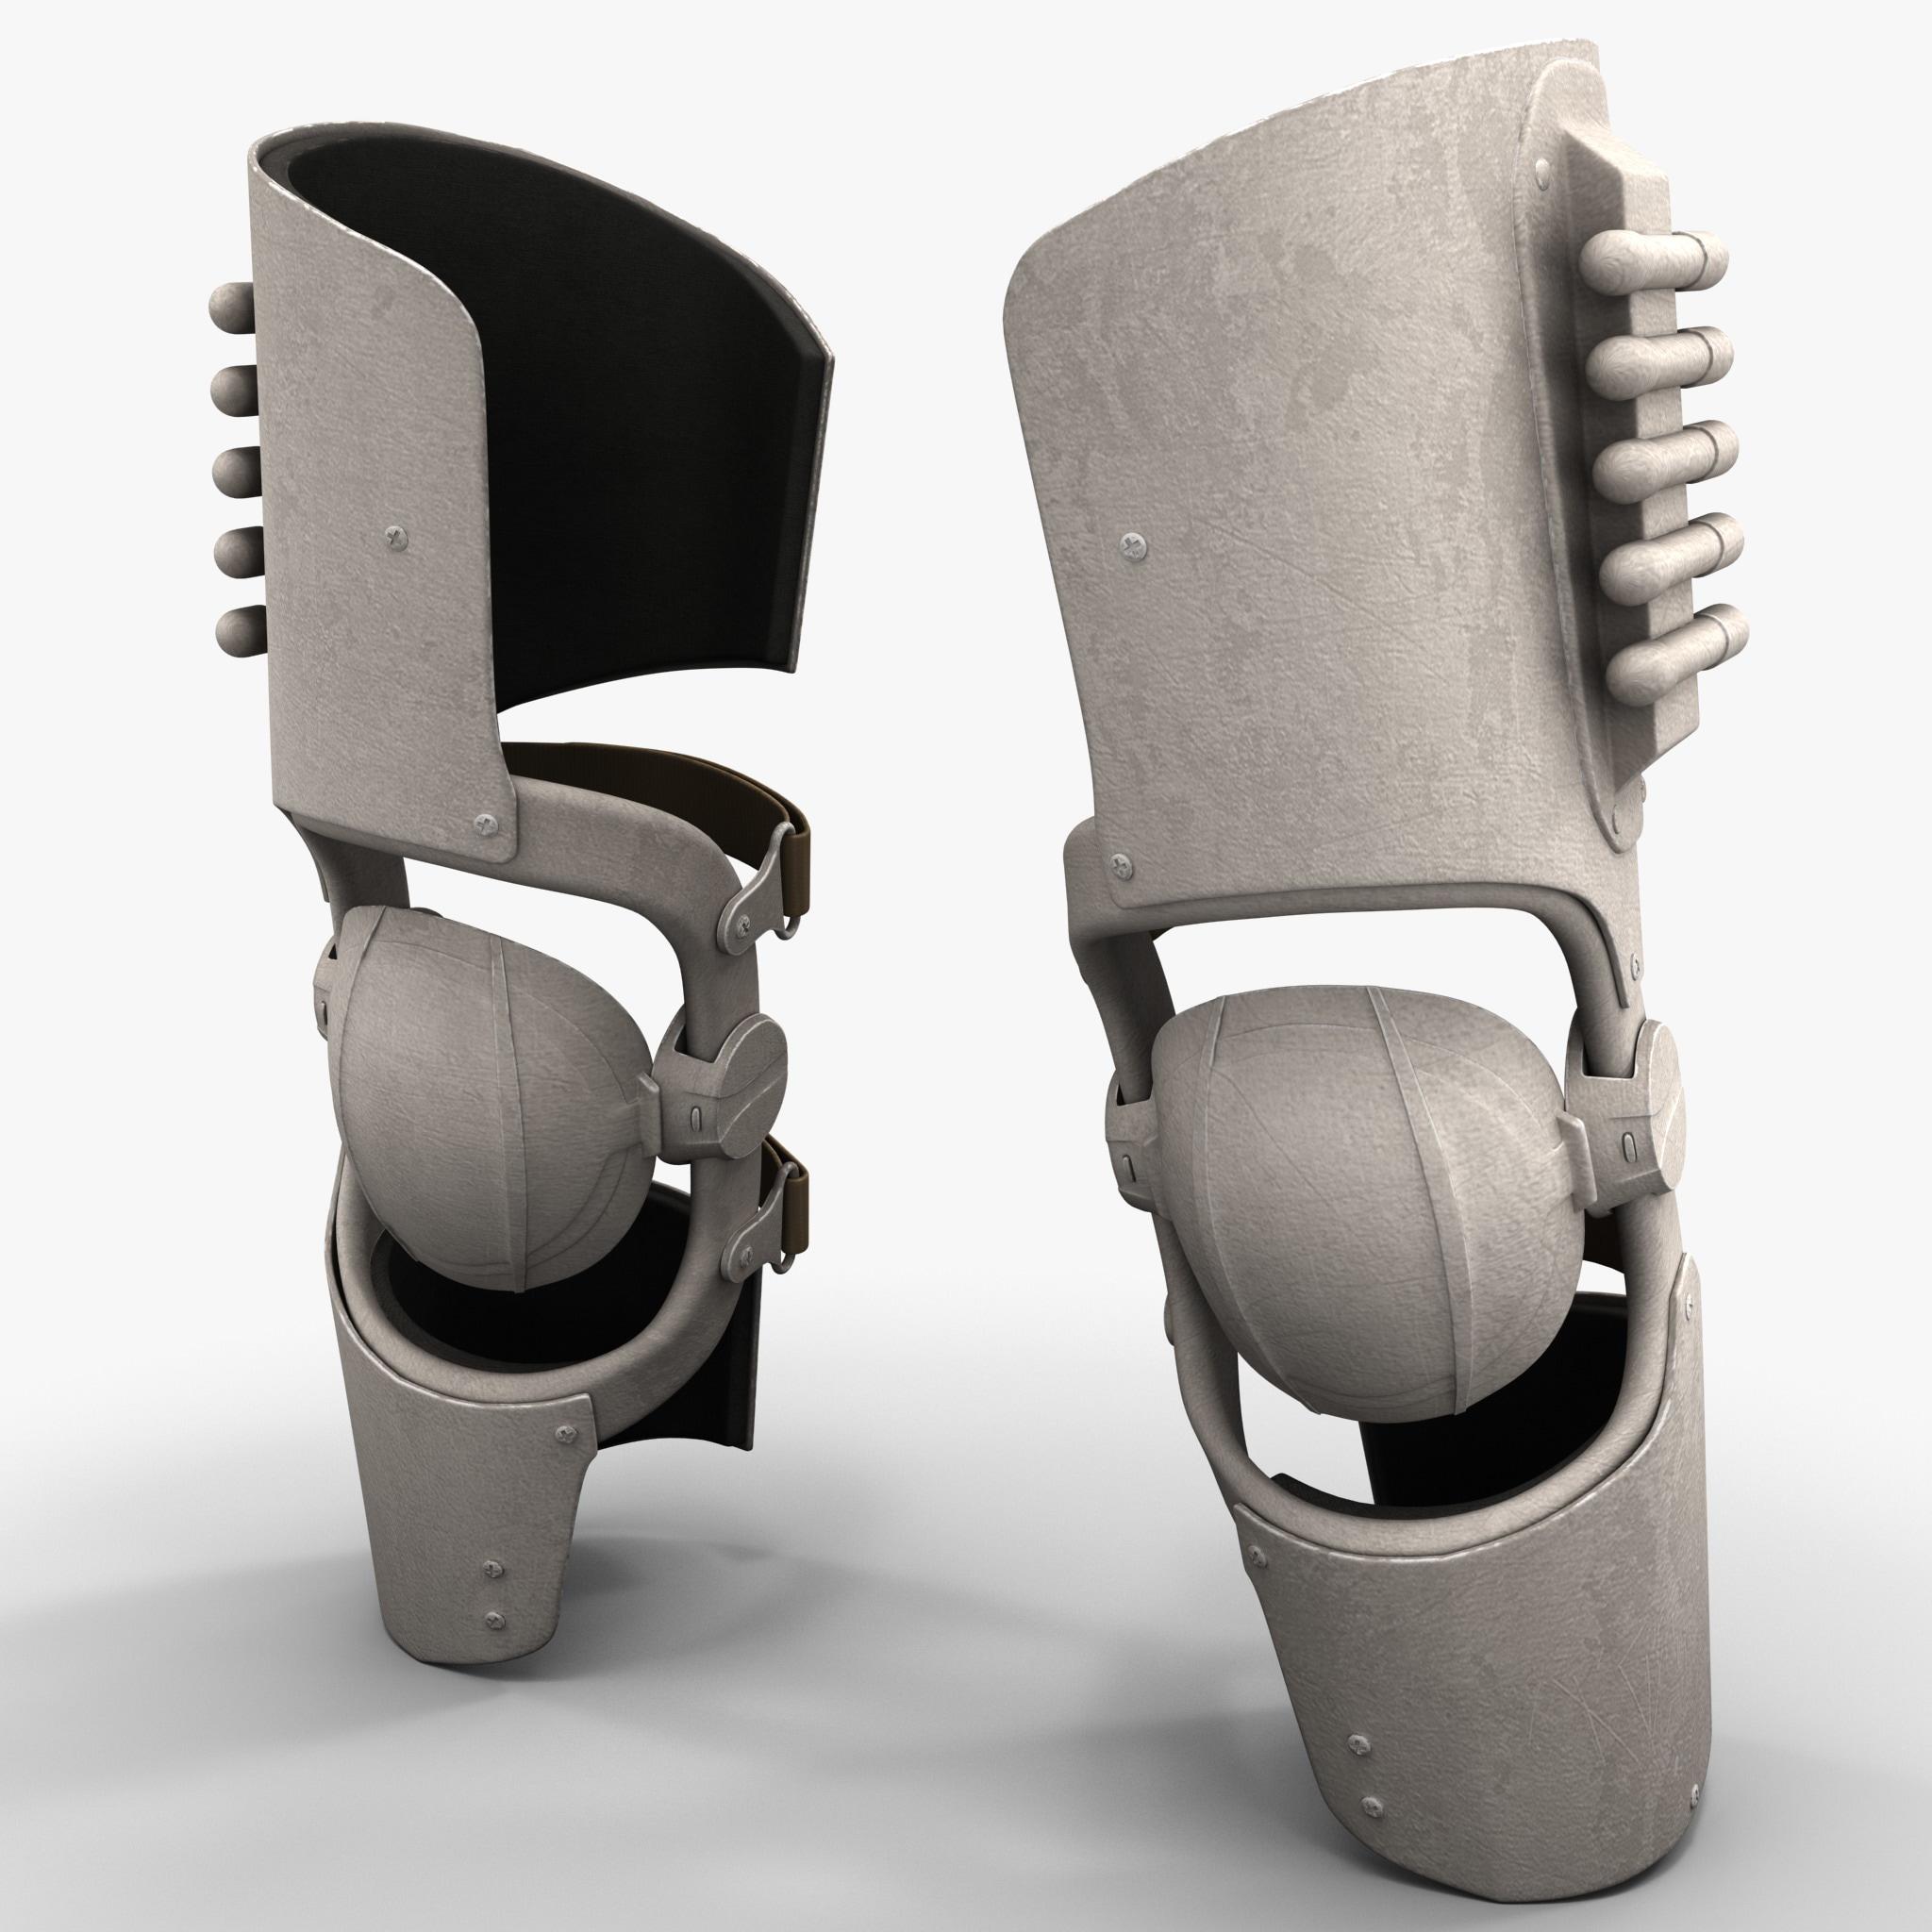 Futuristic Soldier Armor Knee Pads_2.jpg